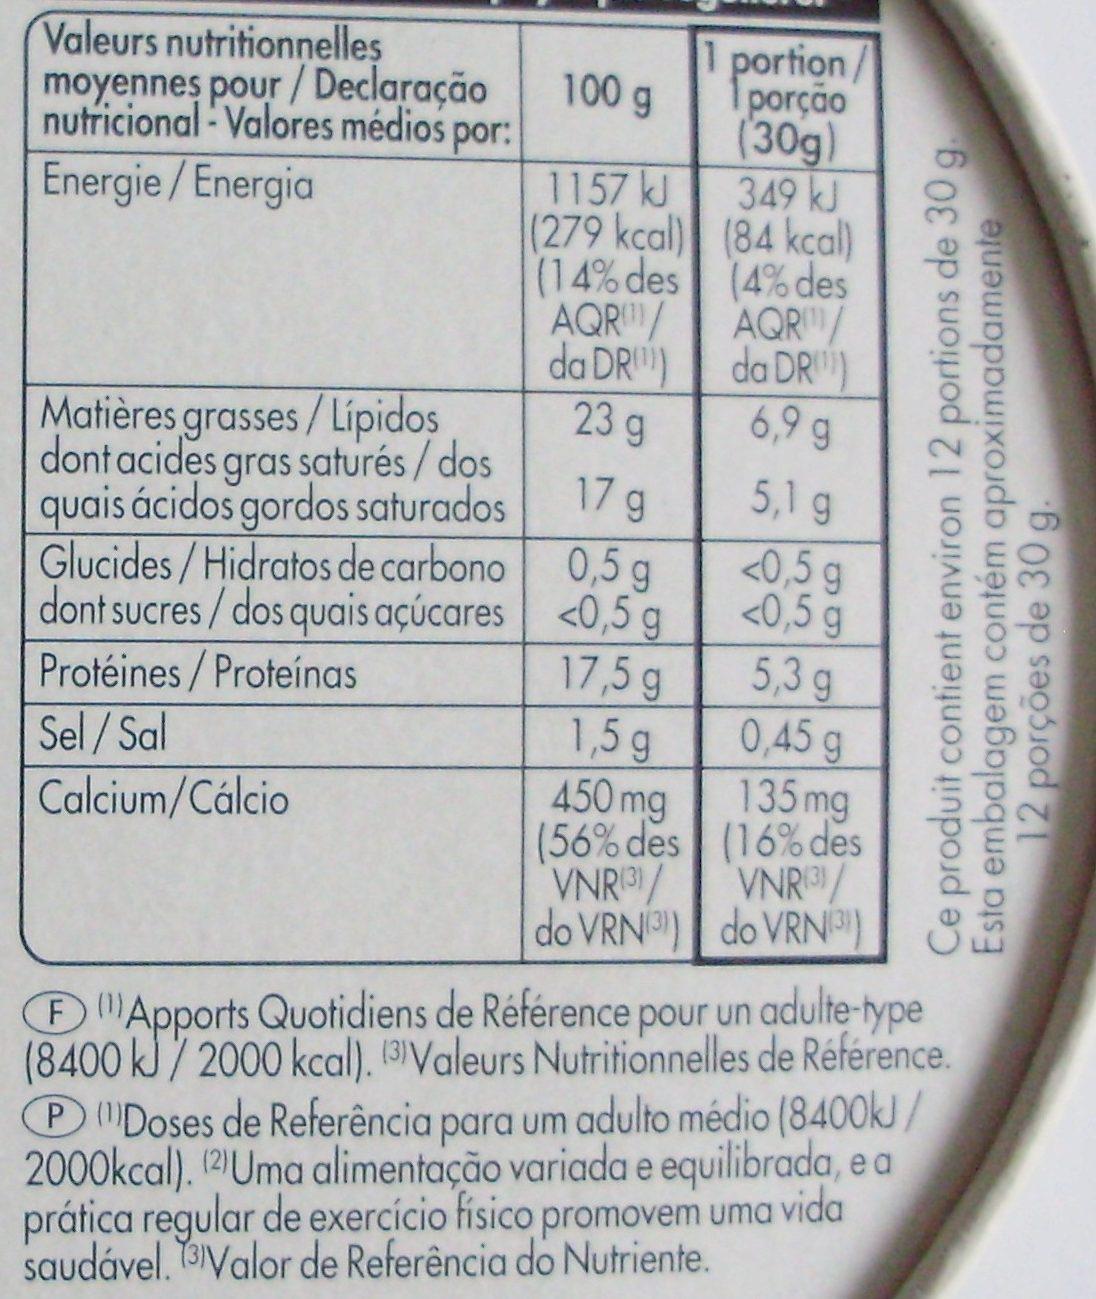 Coulommiers (23 % MG) - Informação nutricional